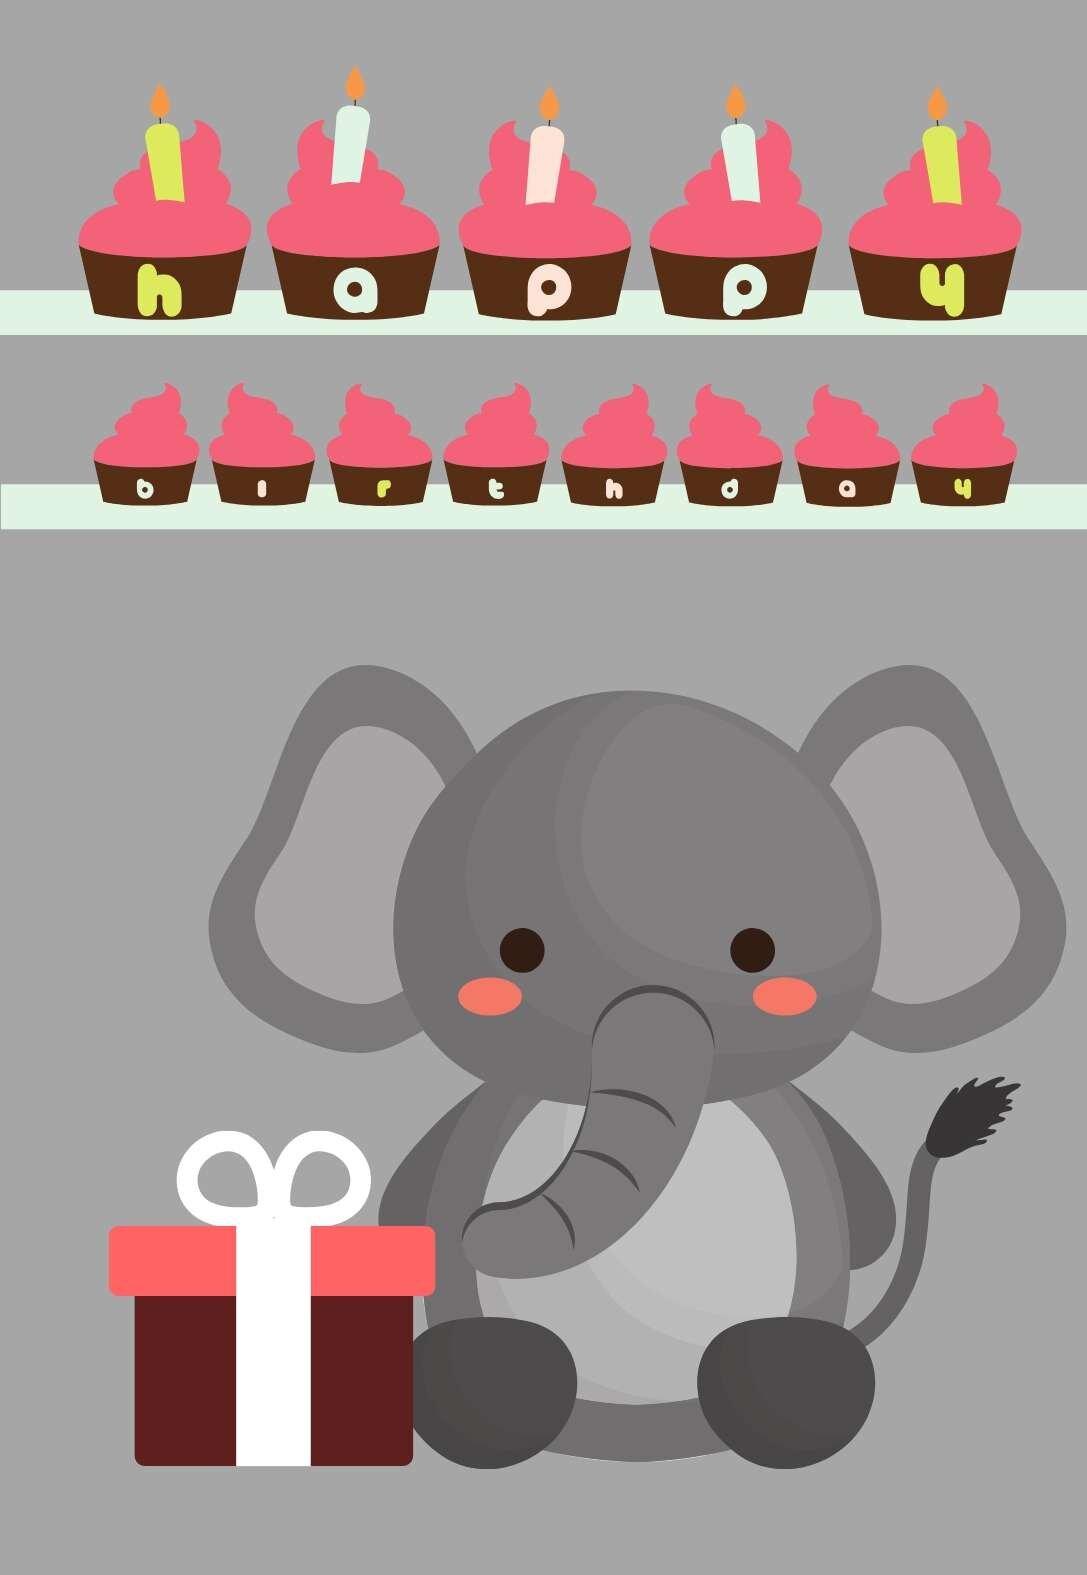 Animal Blank Greetings Cards,Instant Download Elephant Birthday Card printable cute irrelephant greeting card elephants illustration